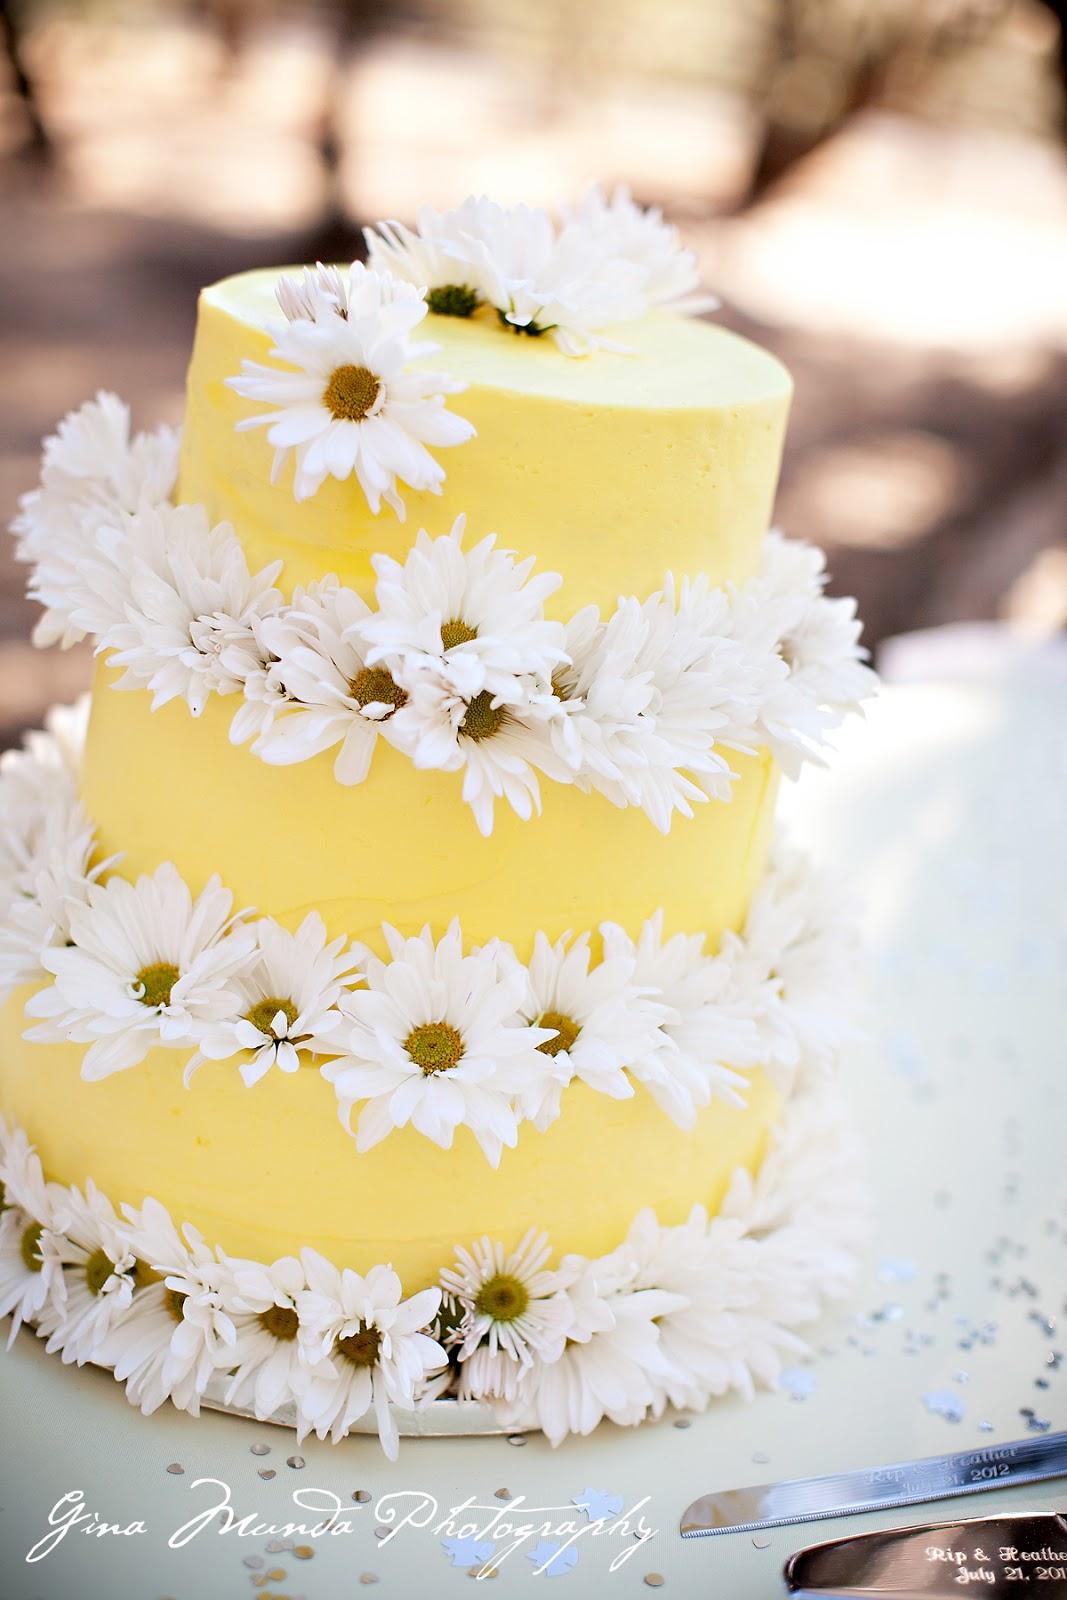 Take the Cake Events: Beautiful backyard wedding